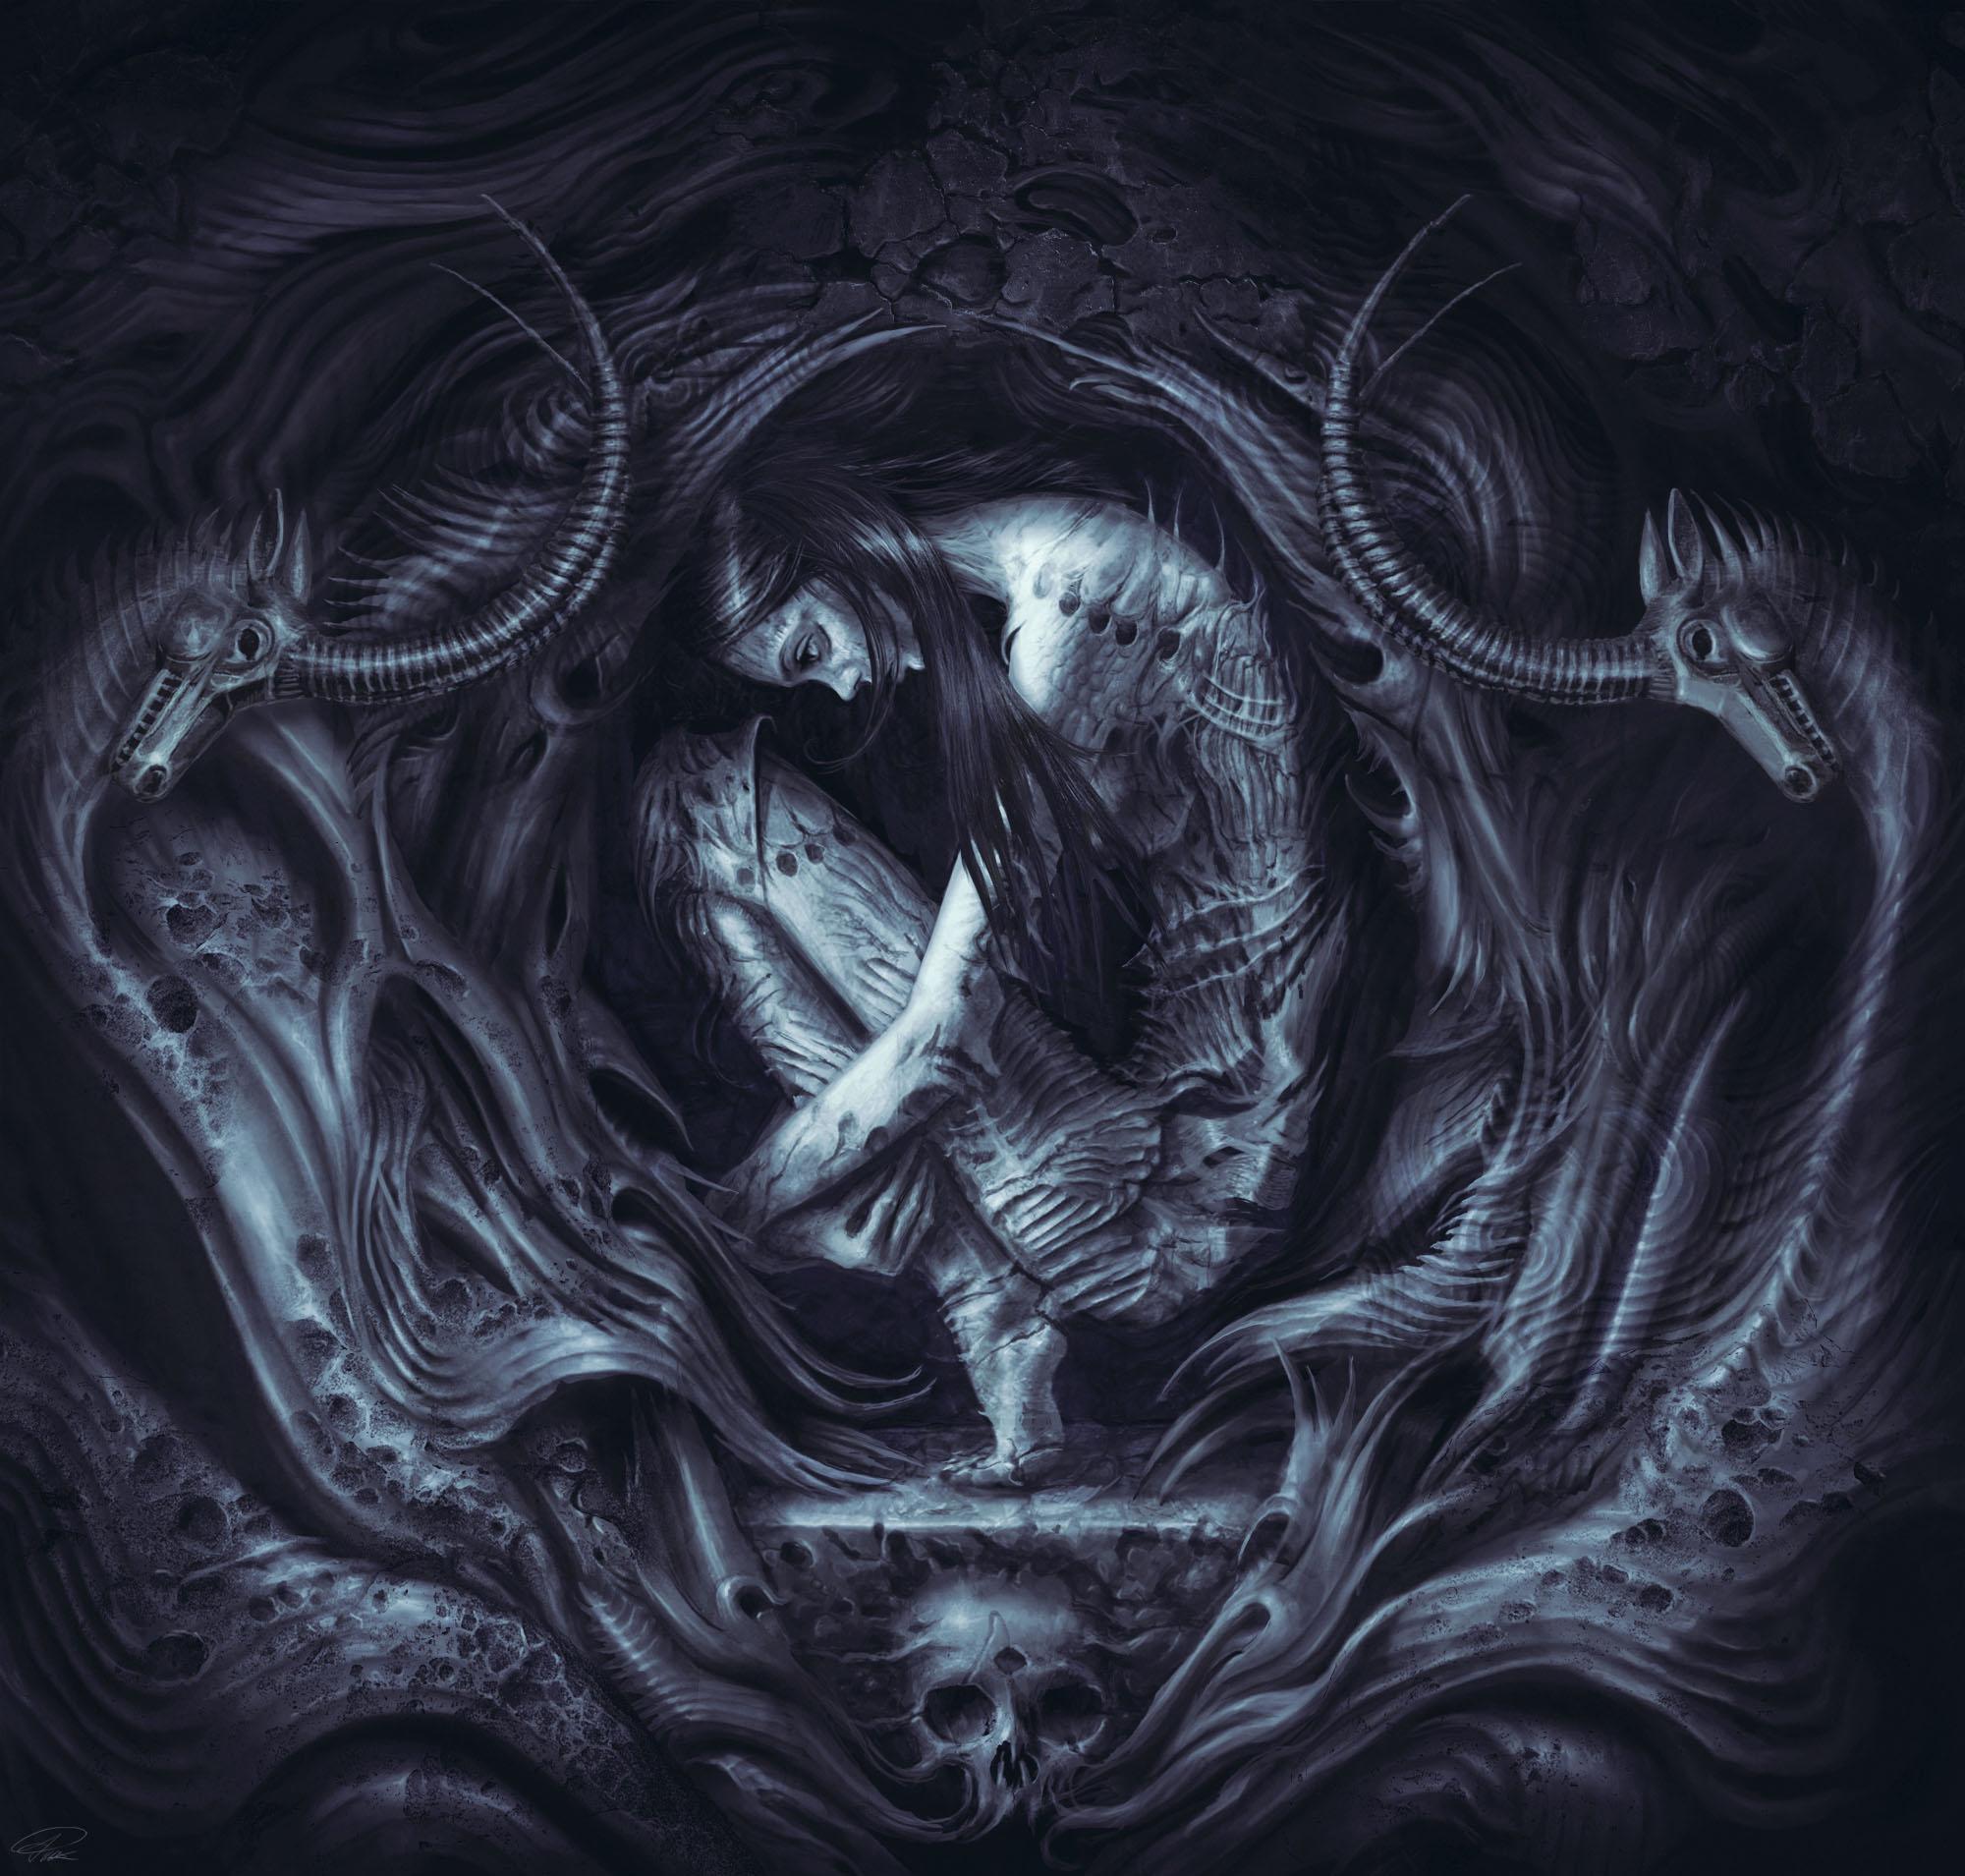 Black Womb by ser1o